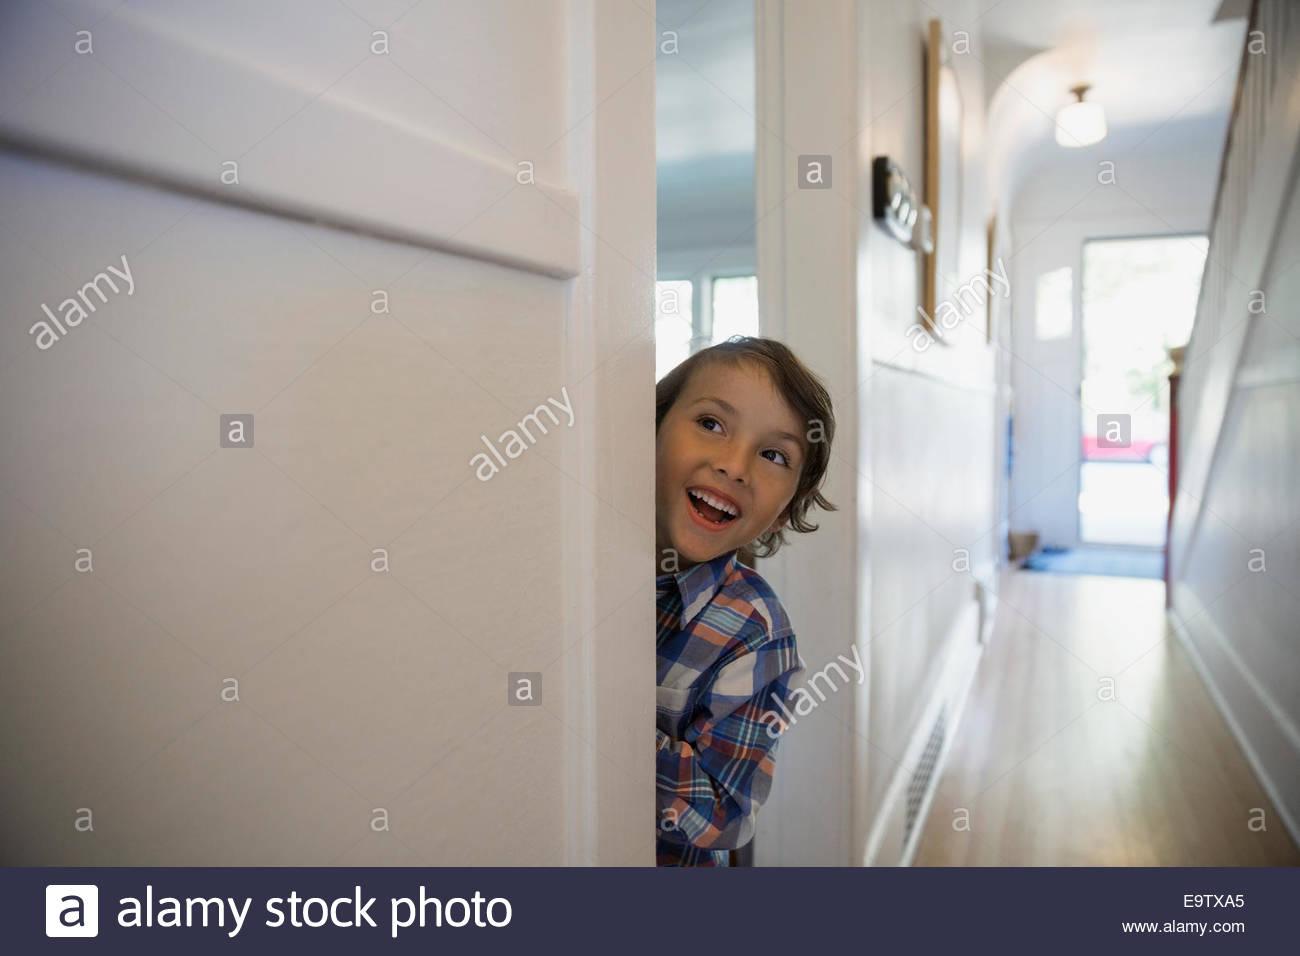 Begeistert junge in Tür Stockfoto